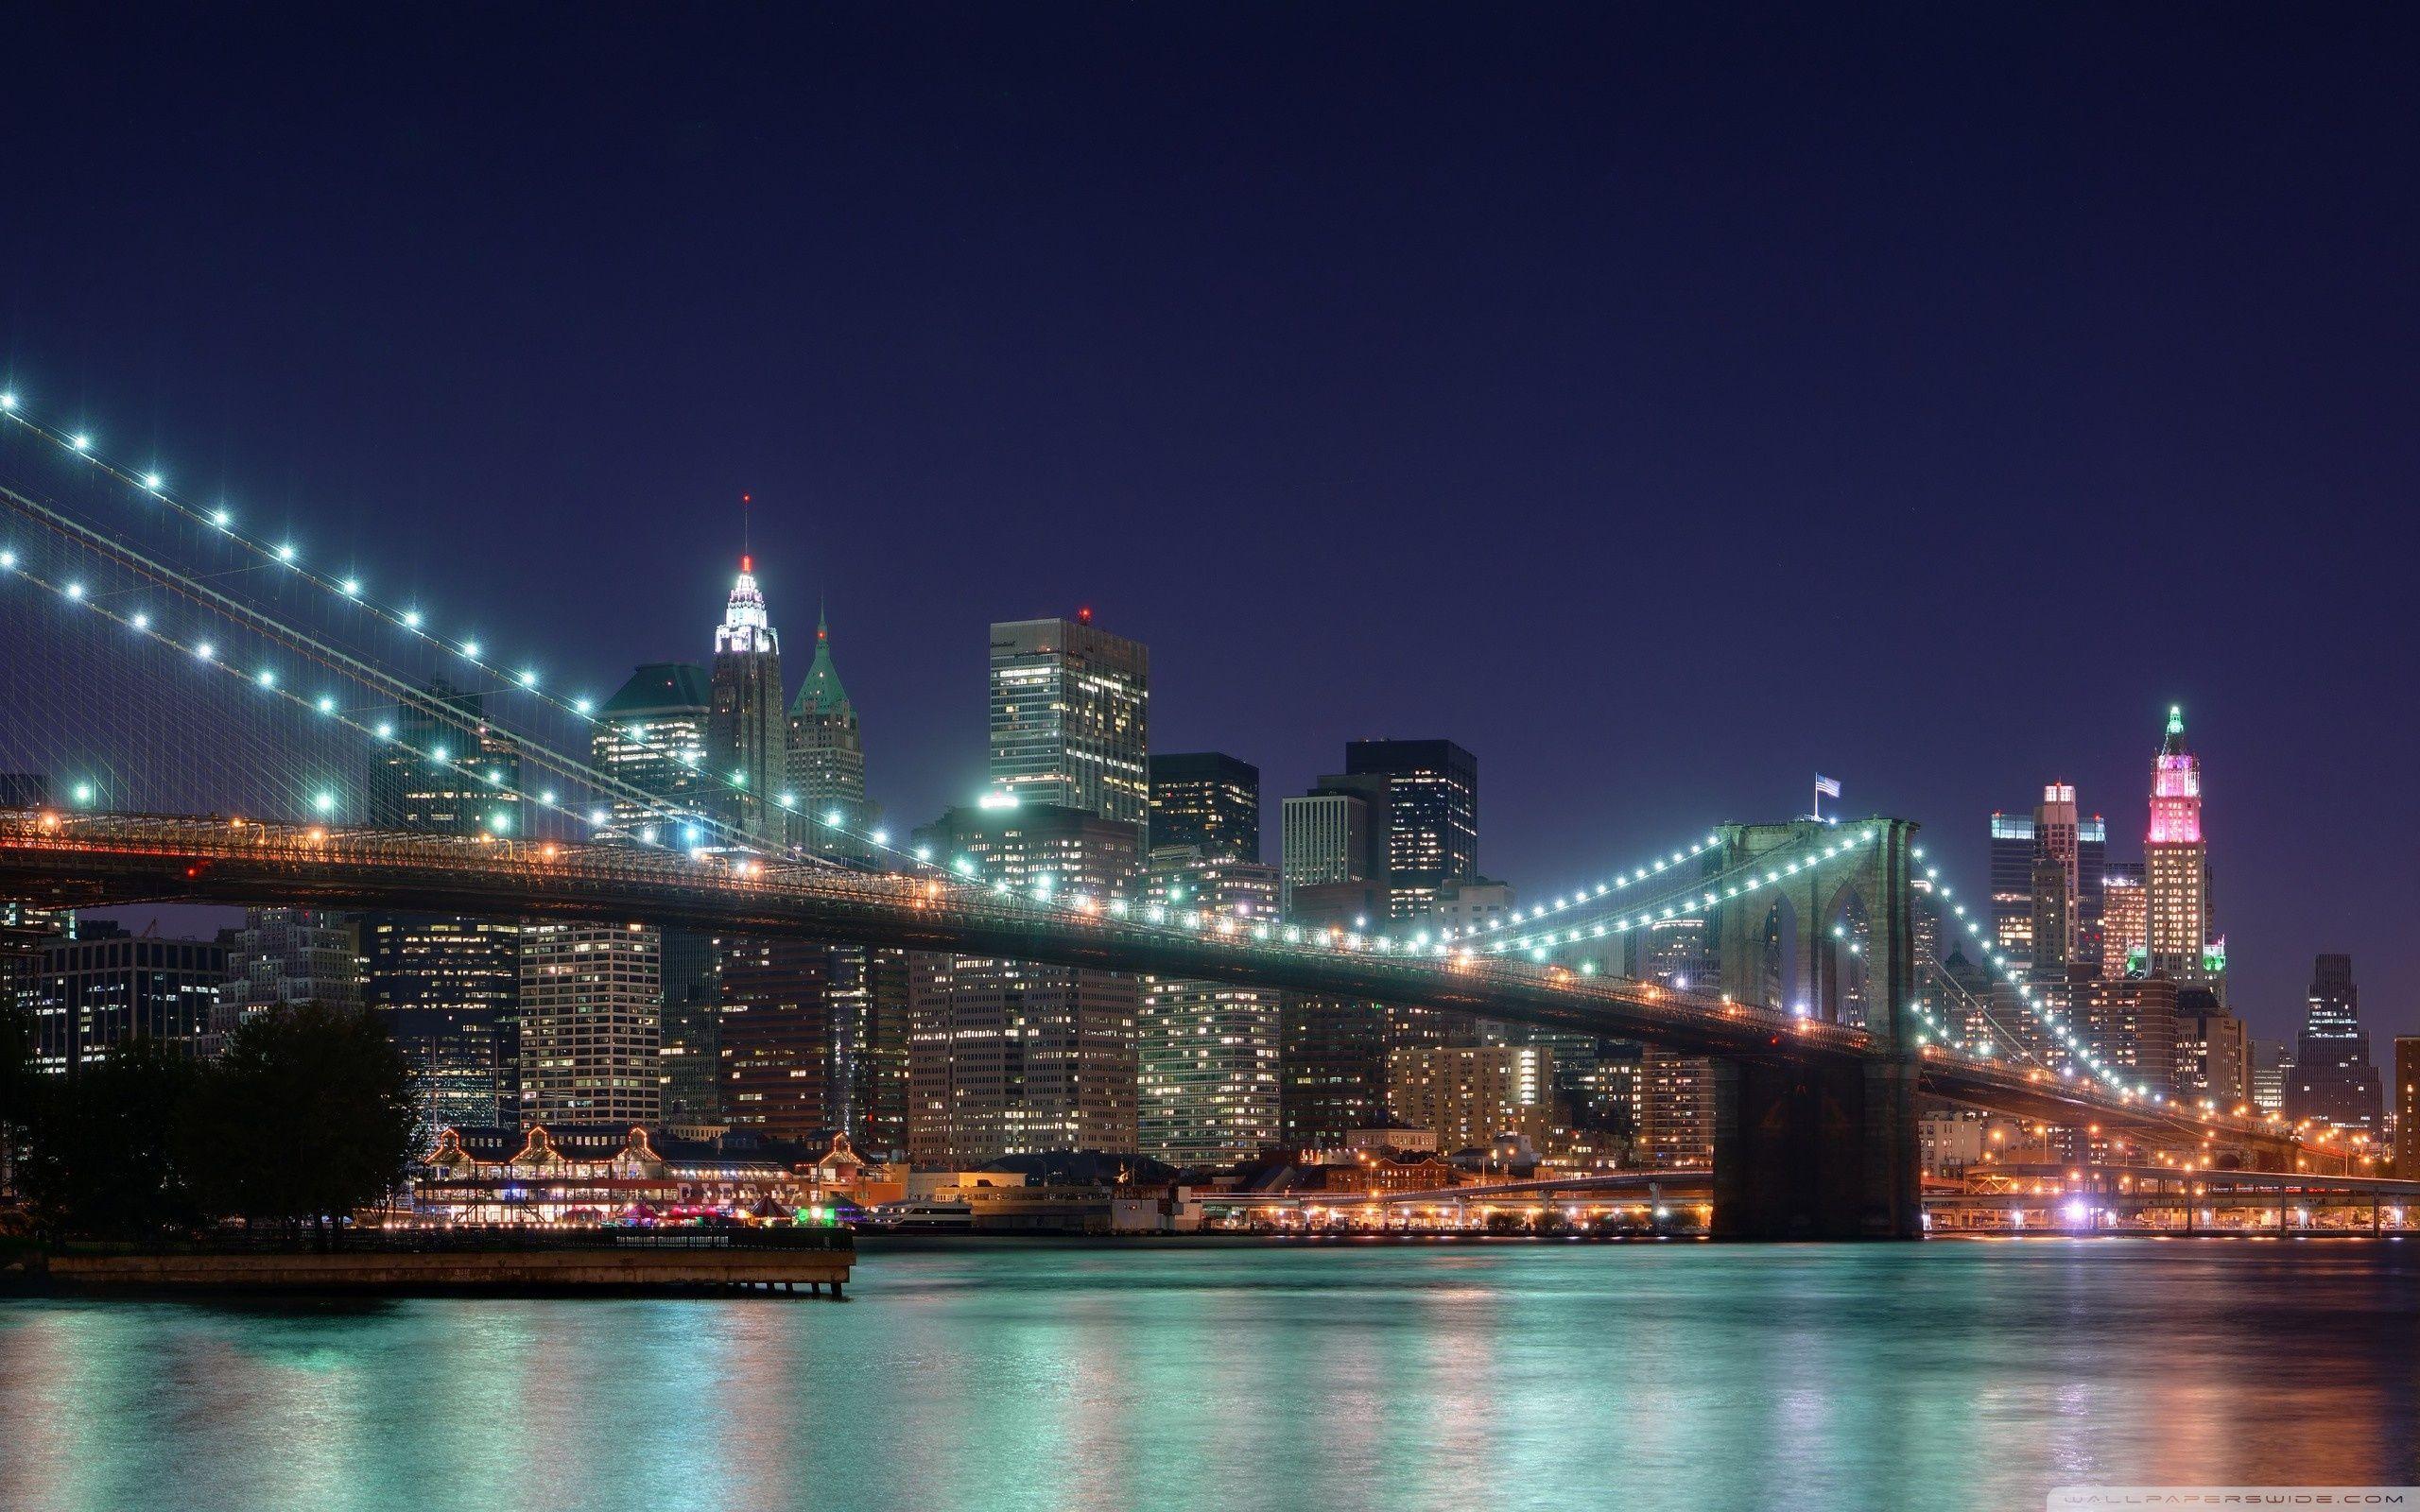 brooklyn bridge, new york hd desktop wallpaper : high definition